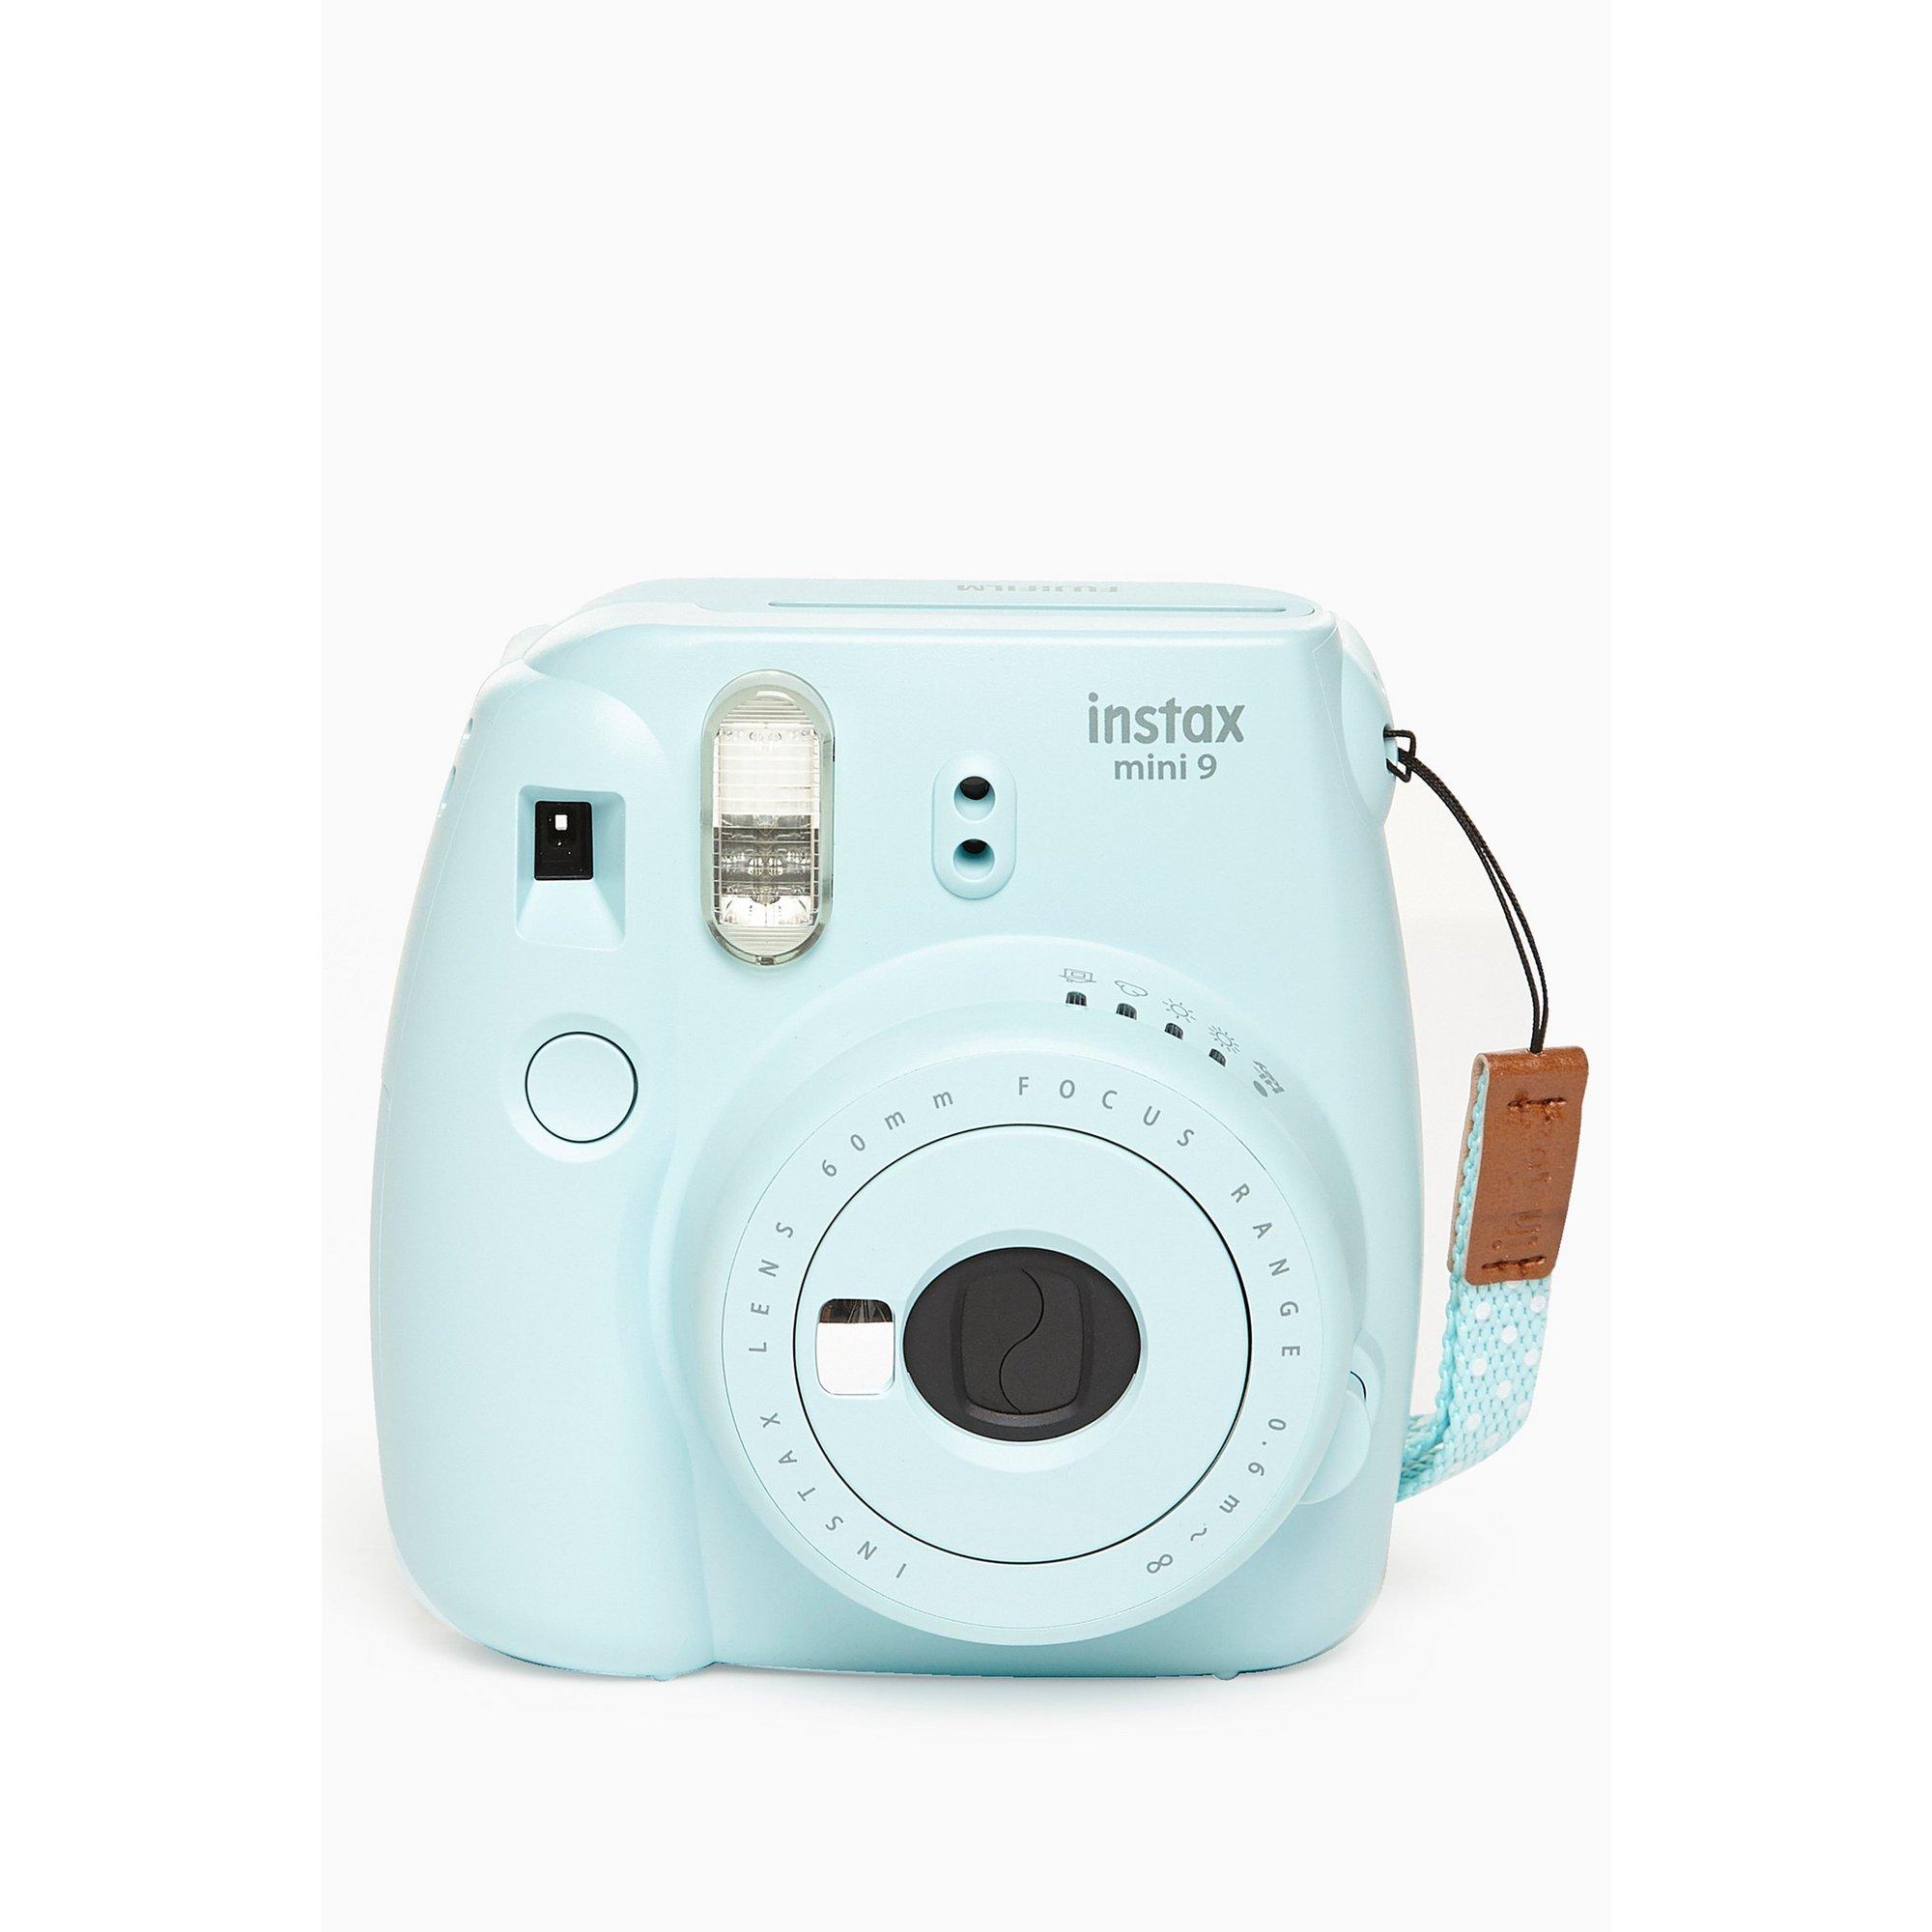 Image of Fujifilm Instax Mini 9 Camera with 10 Shots